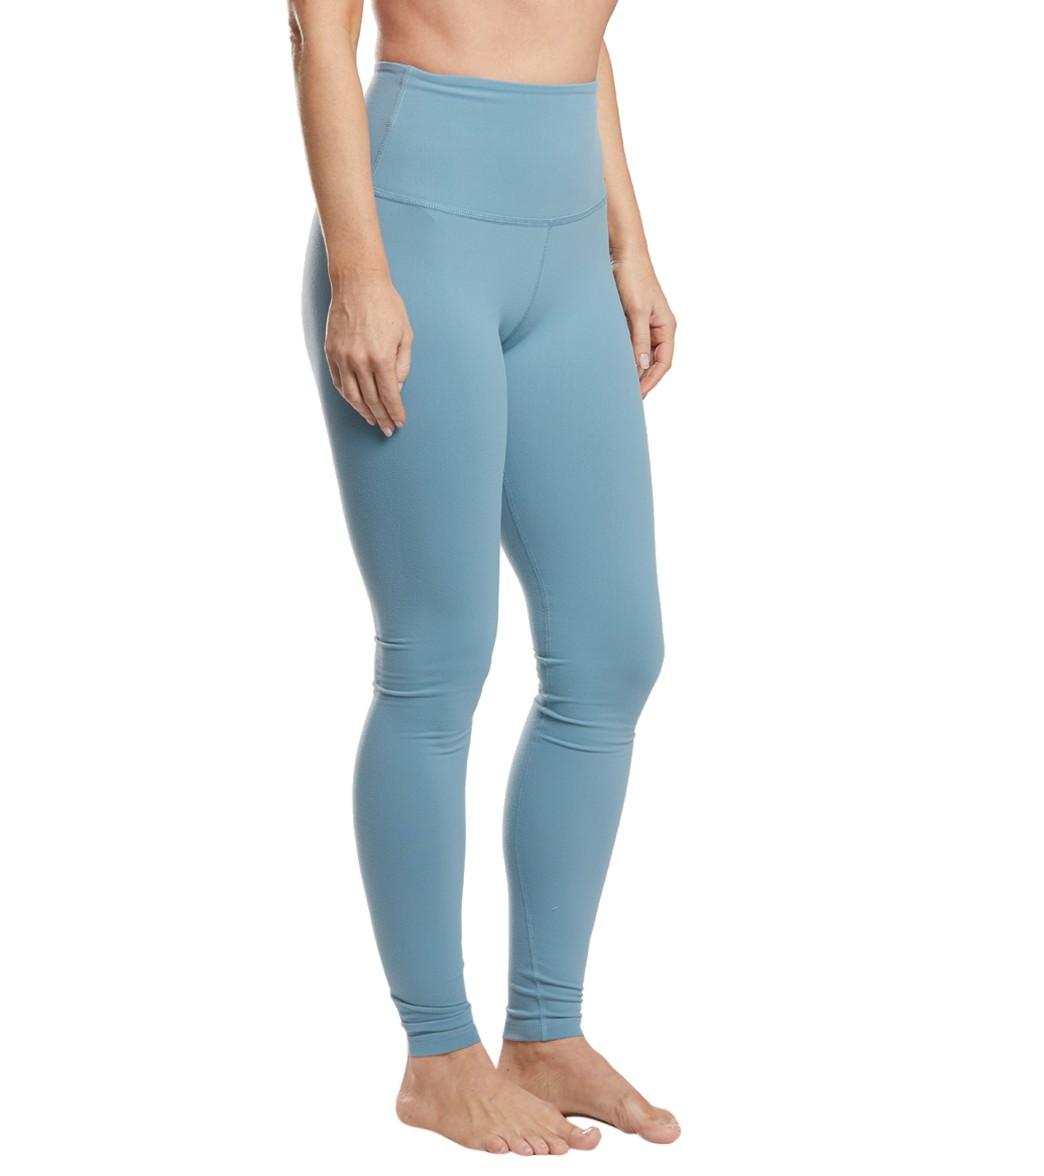 bda67096a0ff8 Beyond Yoga Take Me Higher Yoga Leggings